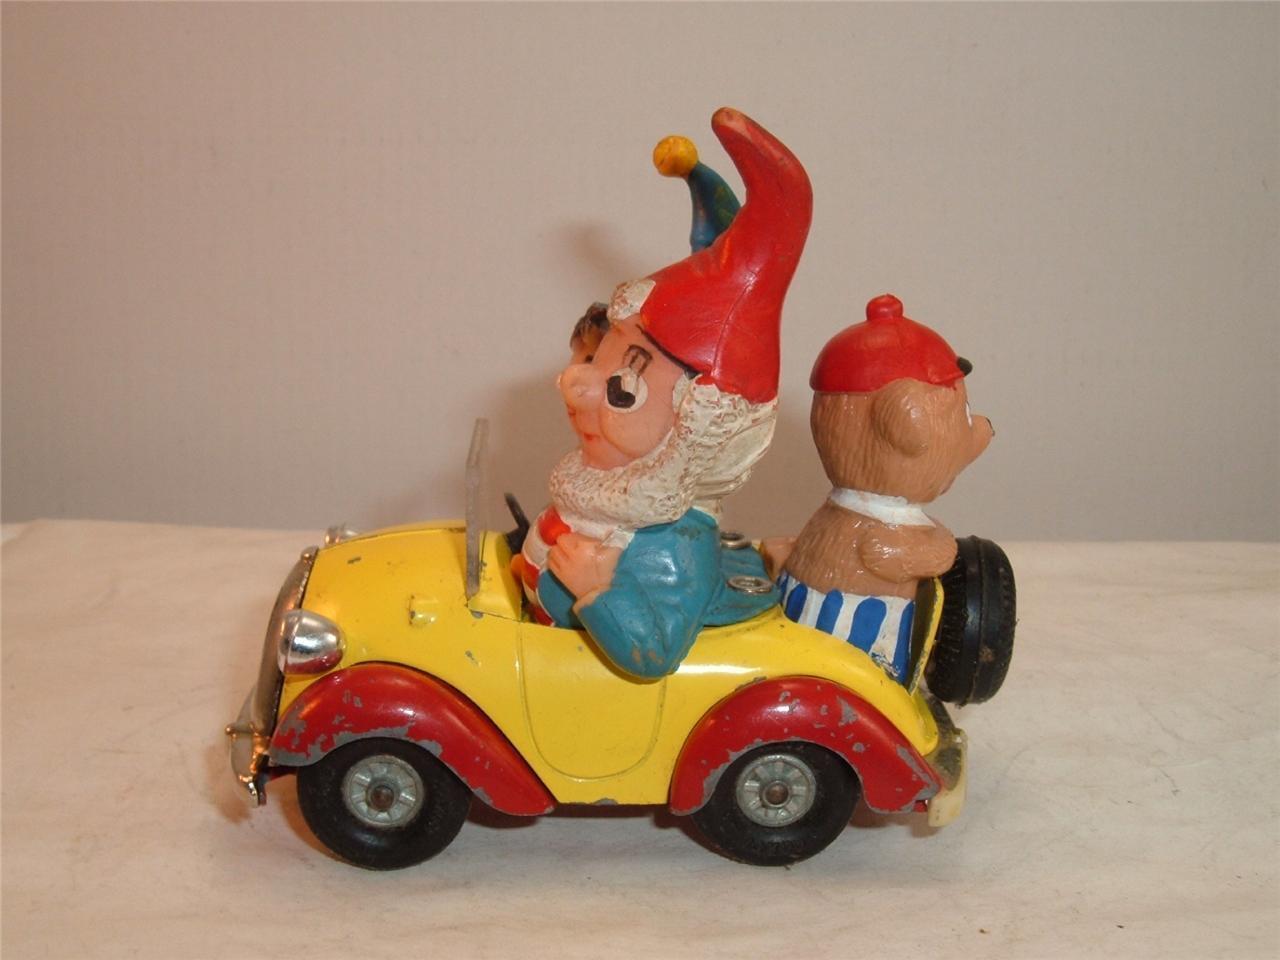 CORGI NODDY'S CAR BIG EARS & TEDDY NEW FRONT & HEADLIGHTS SCROLL DOWN 4 PHOTOS